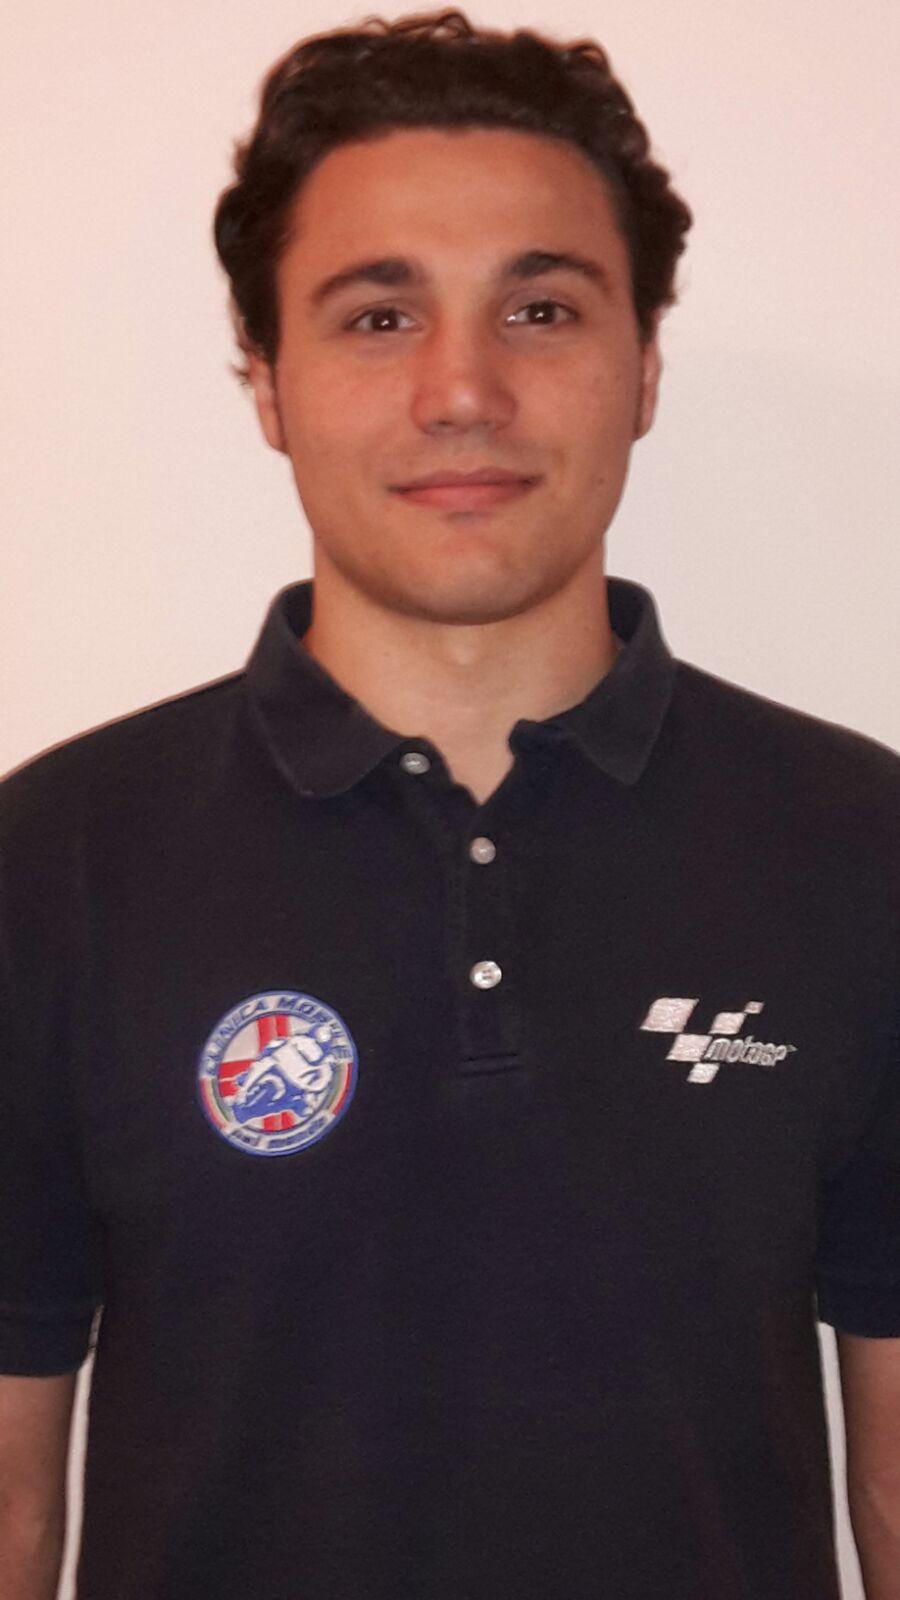 Davide Gallinucci